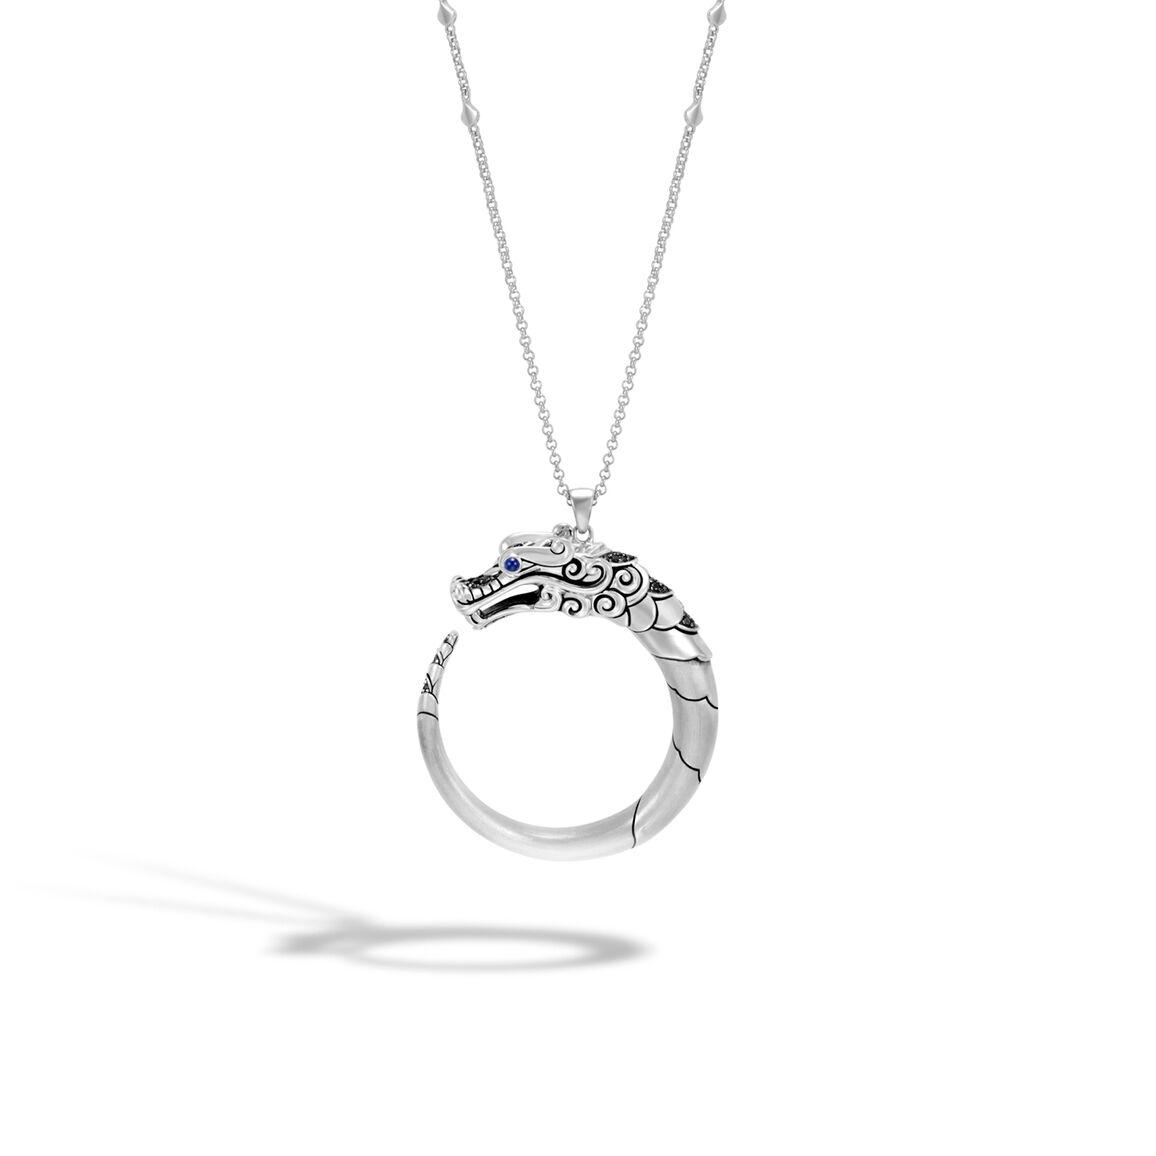 Legends Naga Pendant Necklace, Brushed Silver with Gemstone